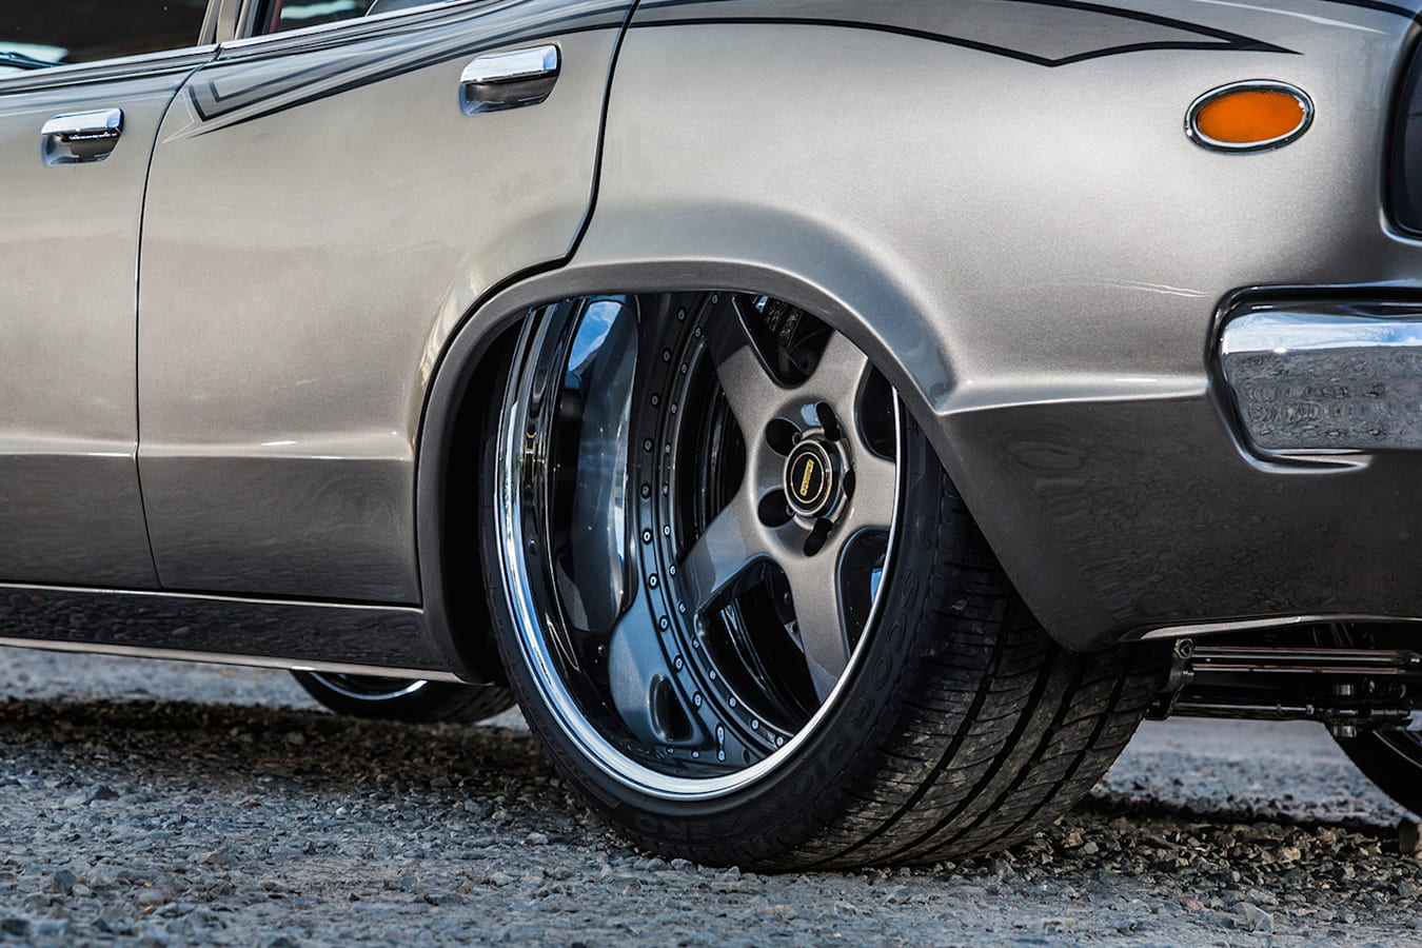 Mazda RX-3 rear wheel